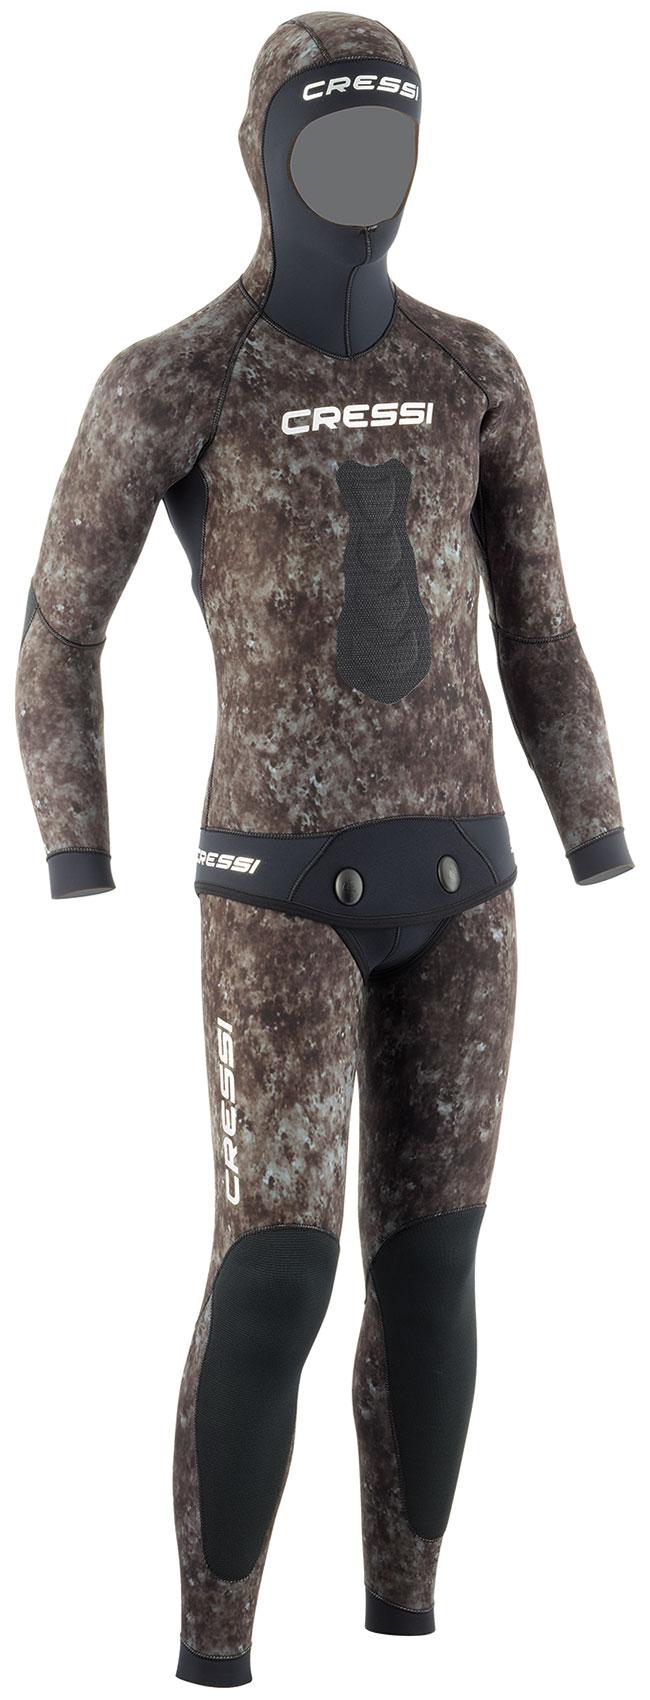 Неопренов костюм за подводен риболов Tracina 5 мм - Cressi